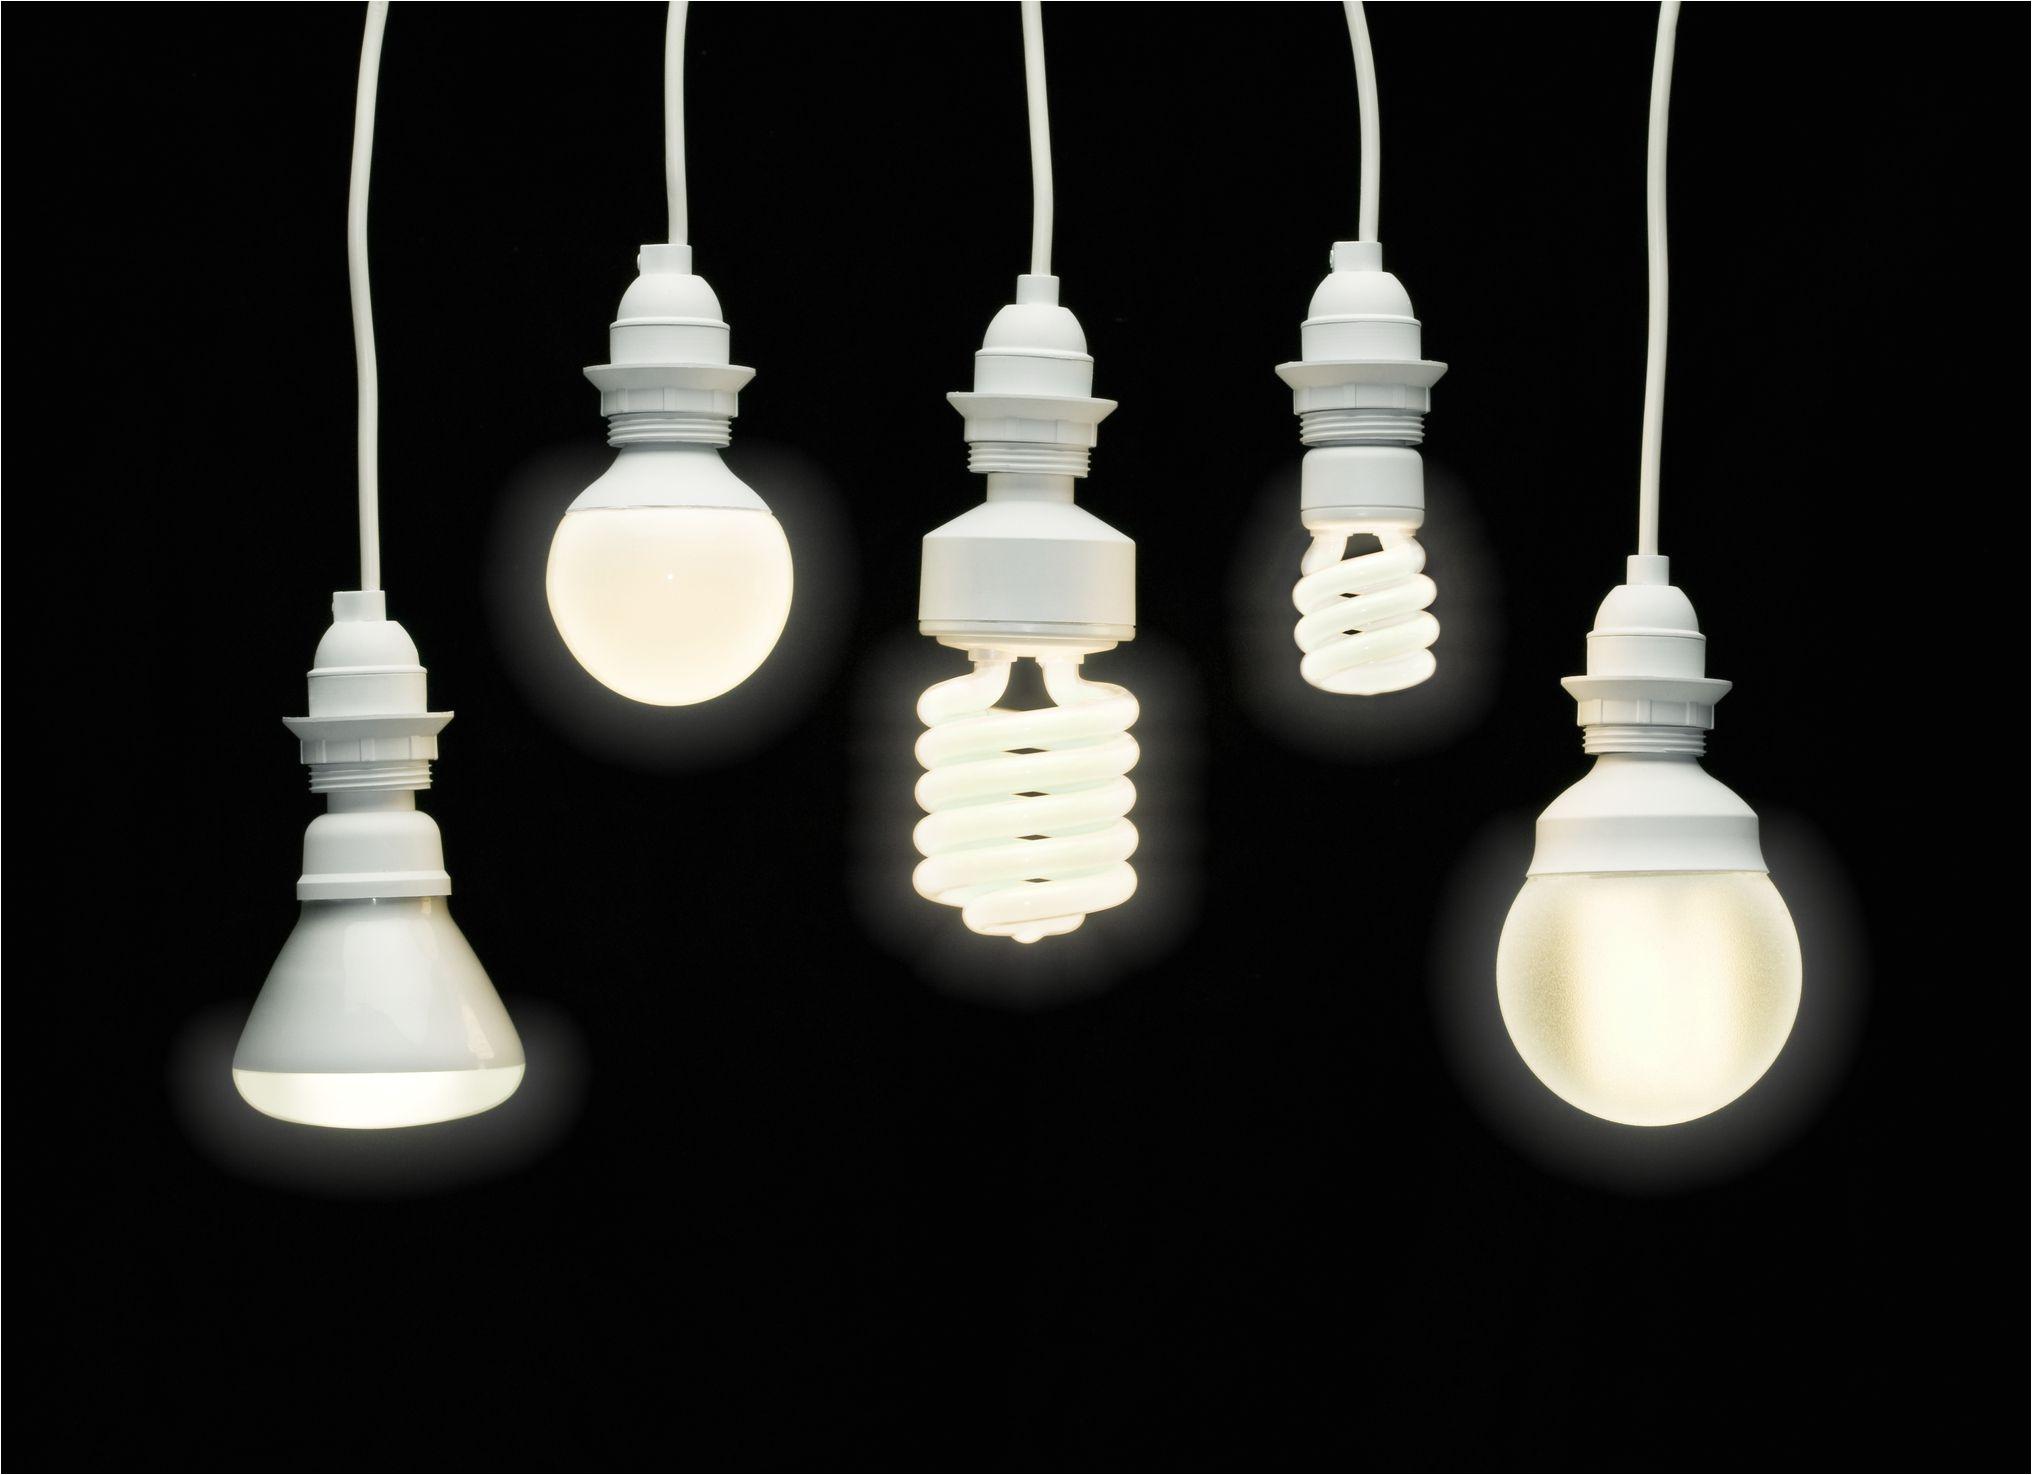 fluorescentlightbulb gettyimages sb10068290h 001 58fa5bb95f9b581d59119216